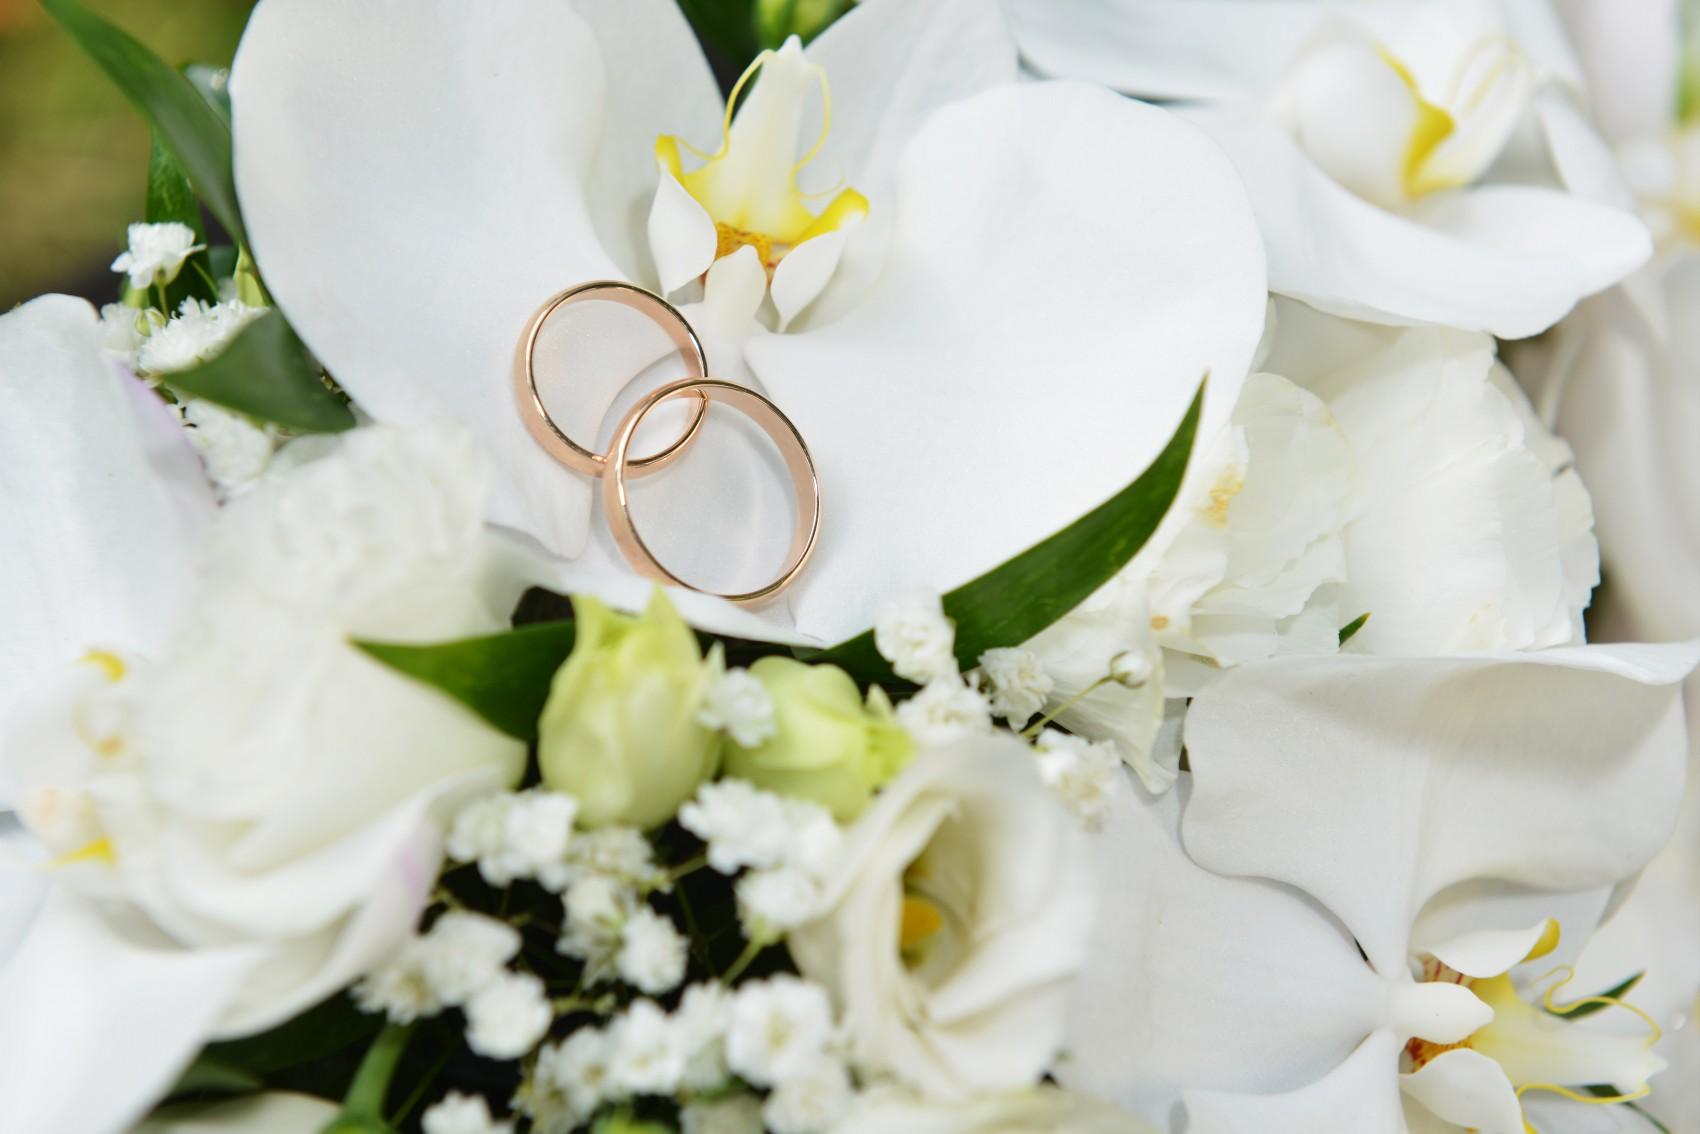 most elegant wedding rings elegant wedding rings Most Elegant Wedding Ring 5